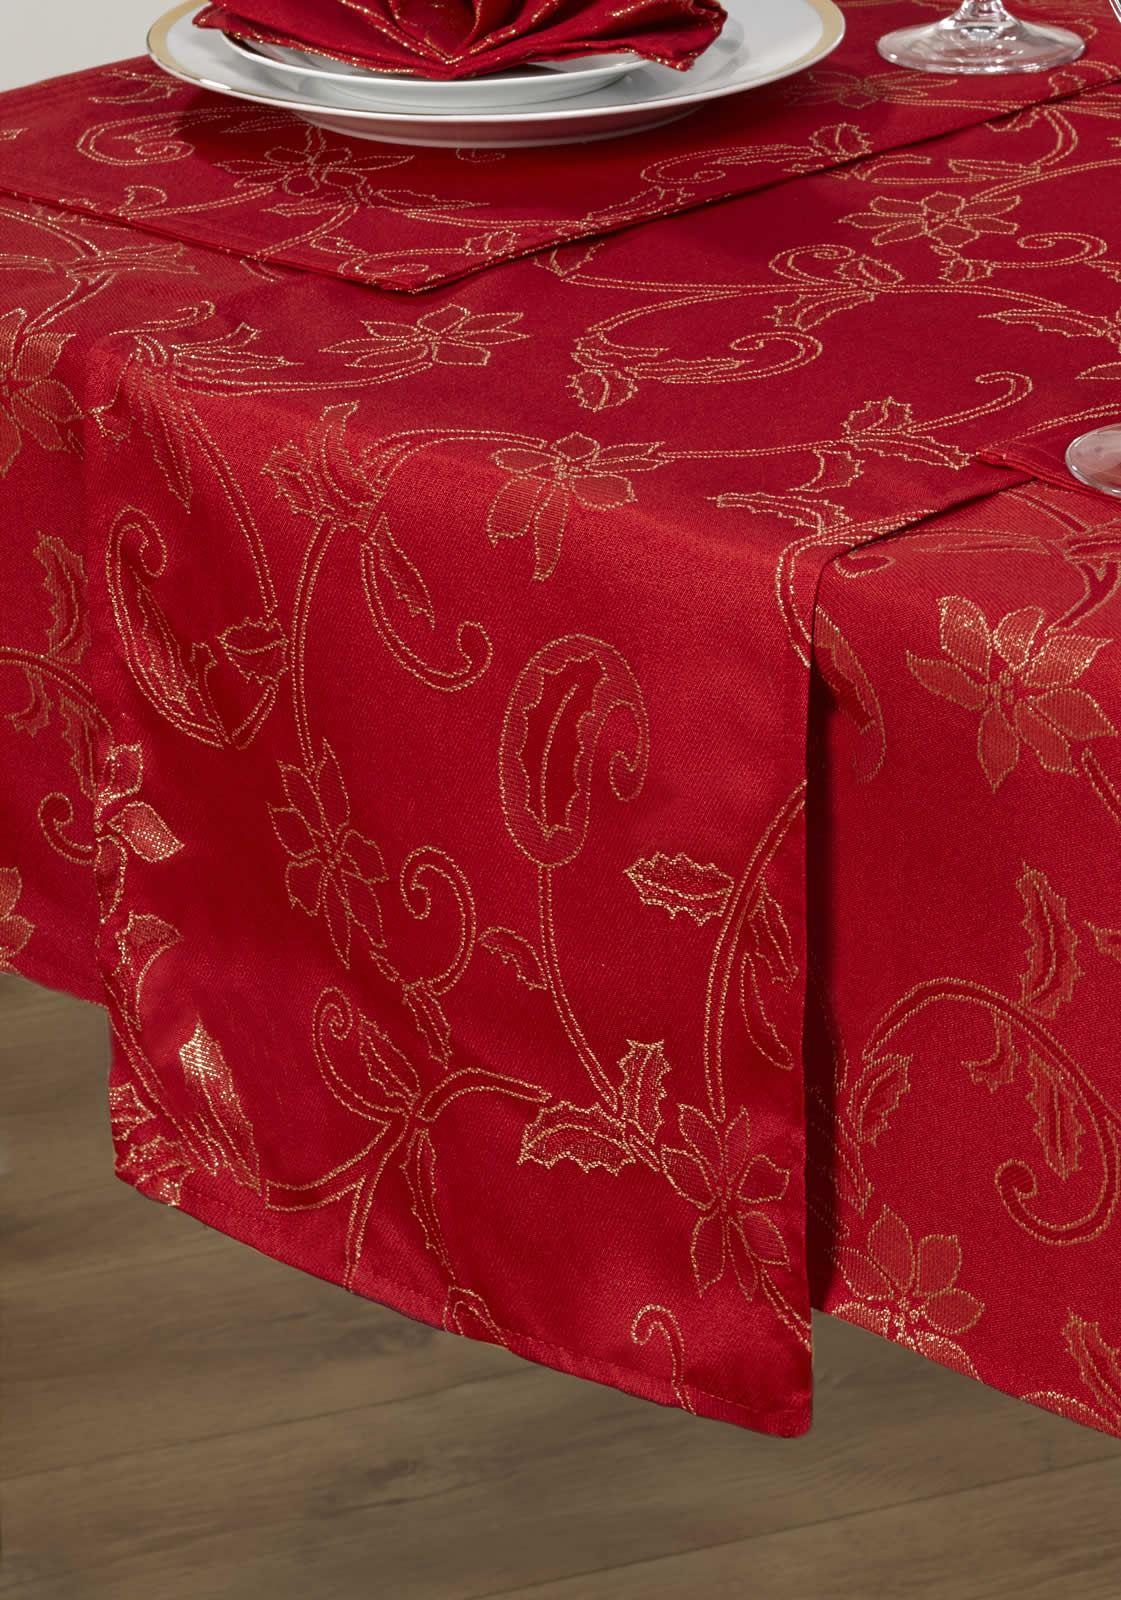 14 Piece Christmas Table Linen Set Cloth Napkins Runner